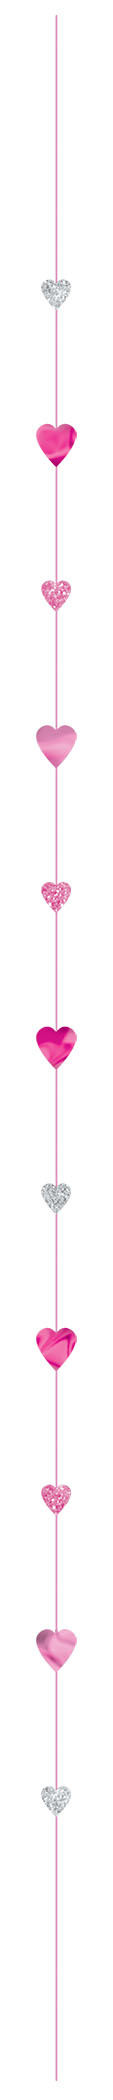 Balloon Fun Strings Hearts